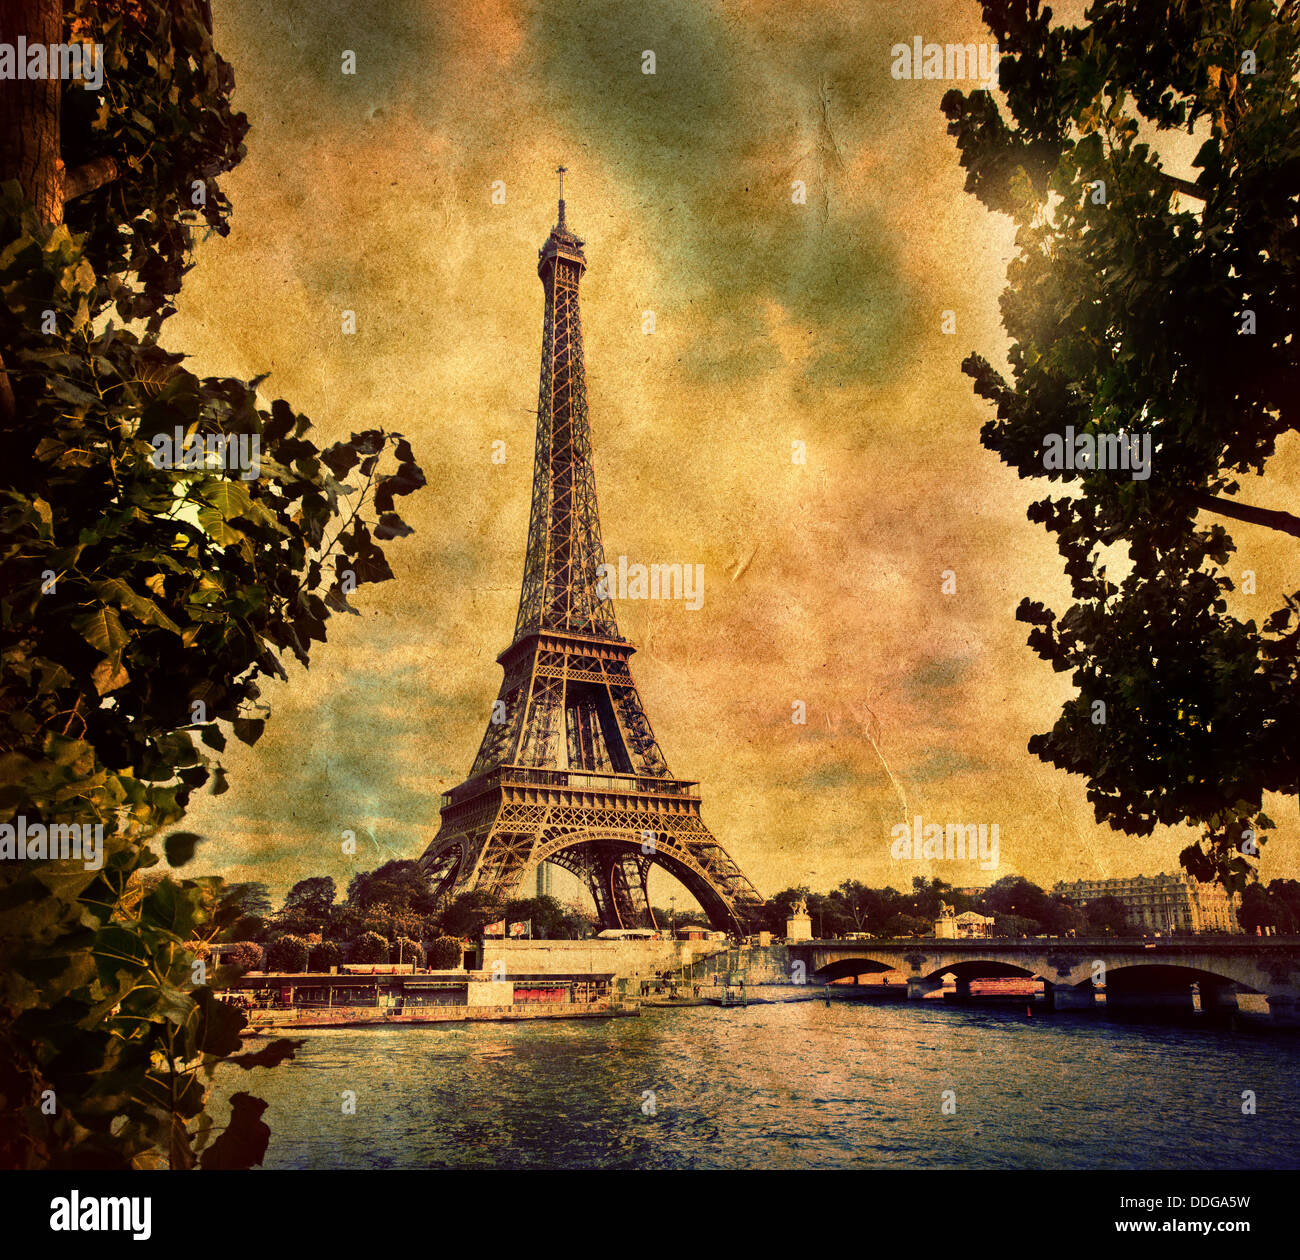 Eiffel Tower, Paris, France. Vintage, retro style art image - Stock Image